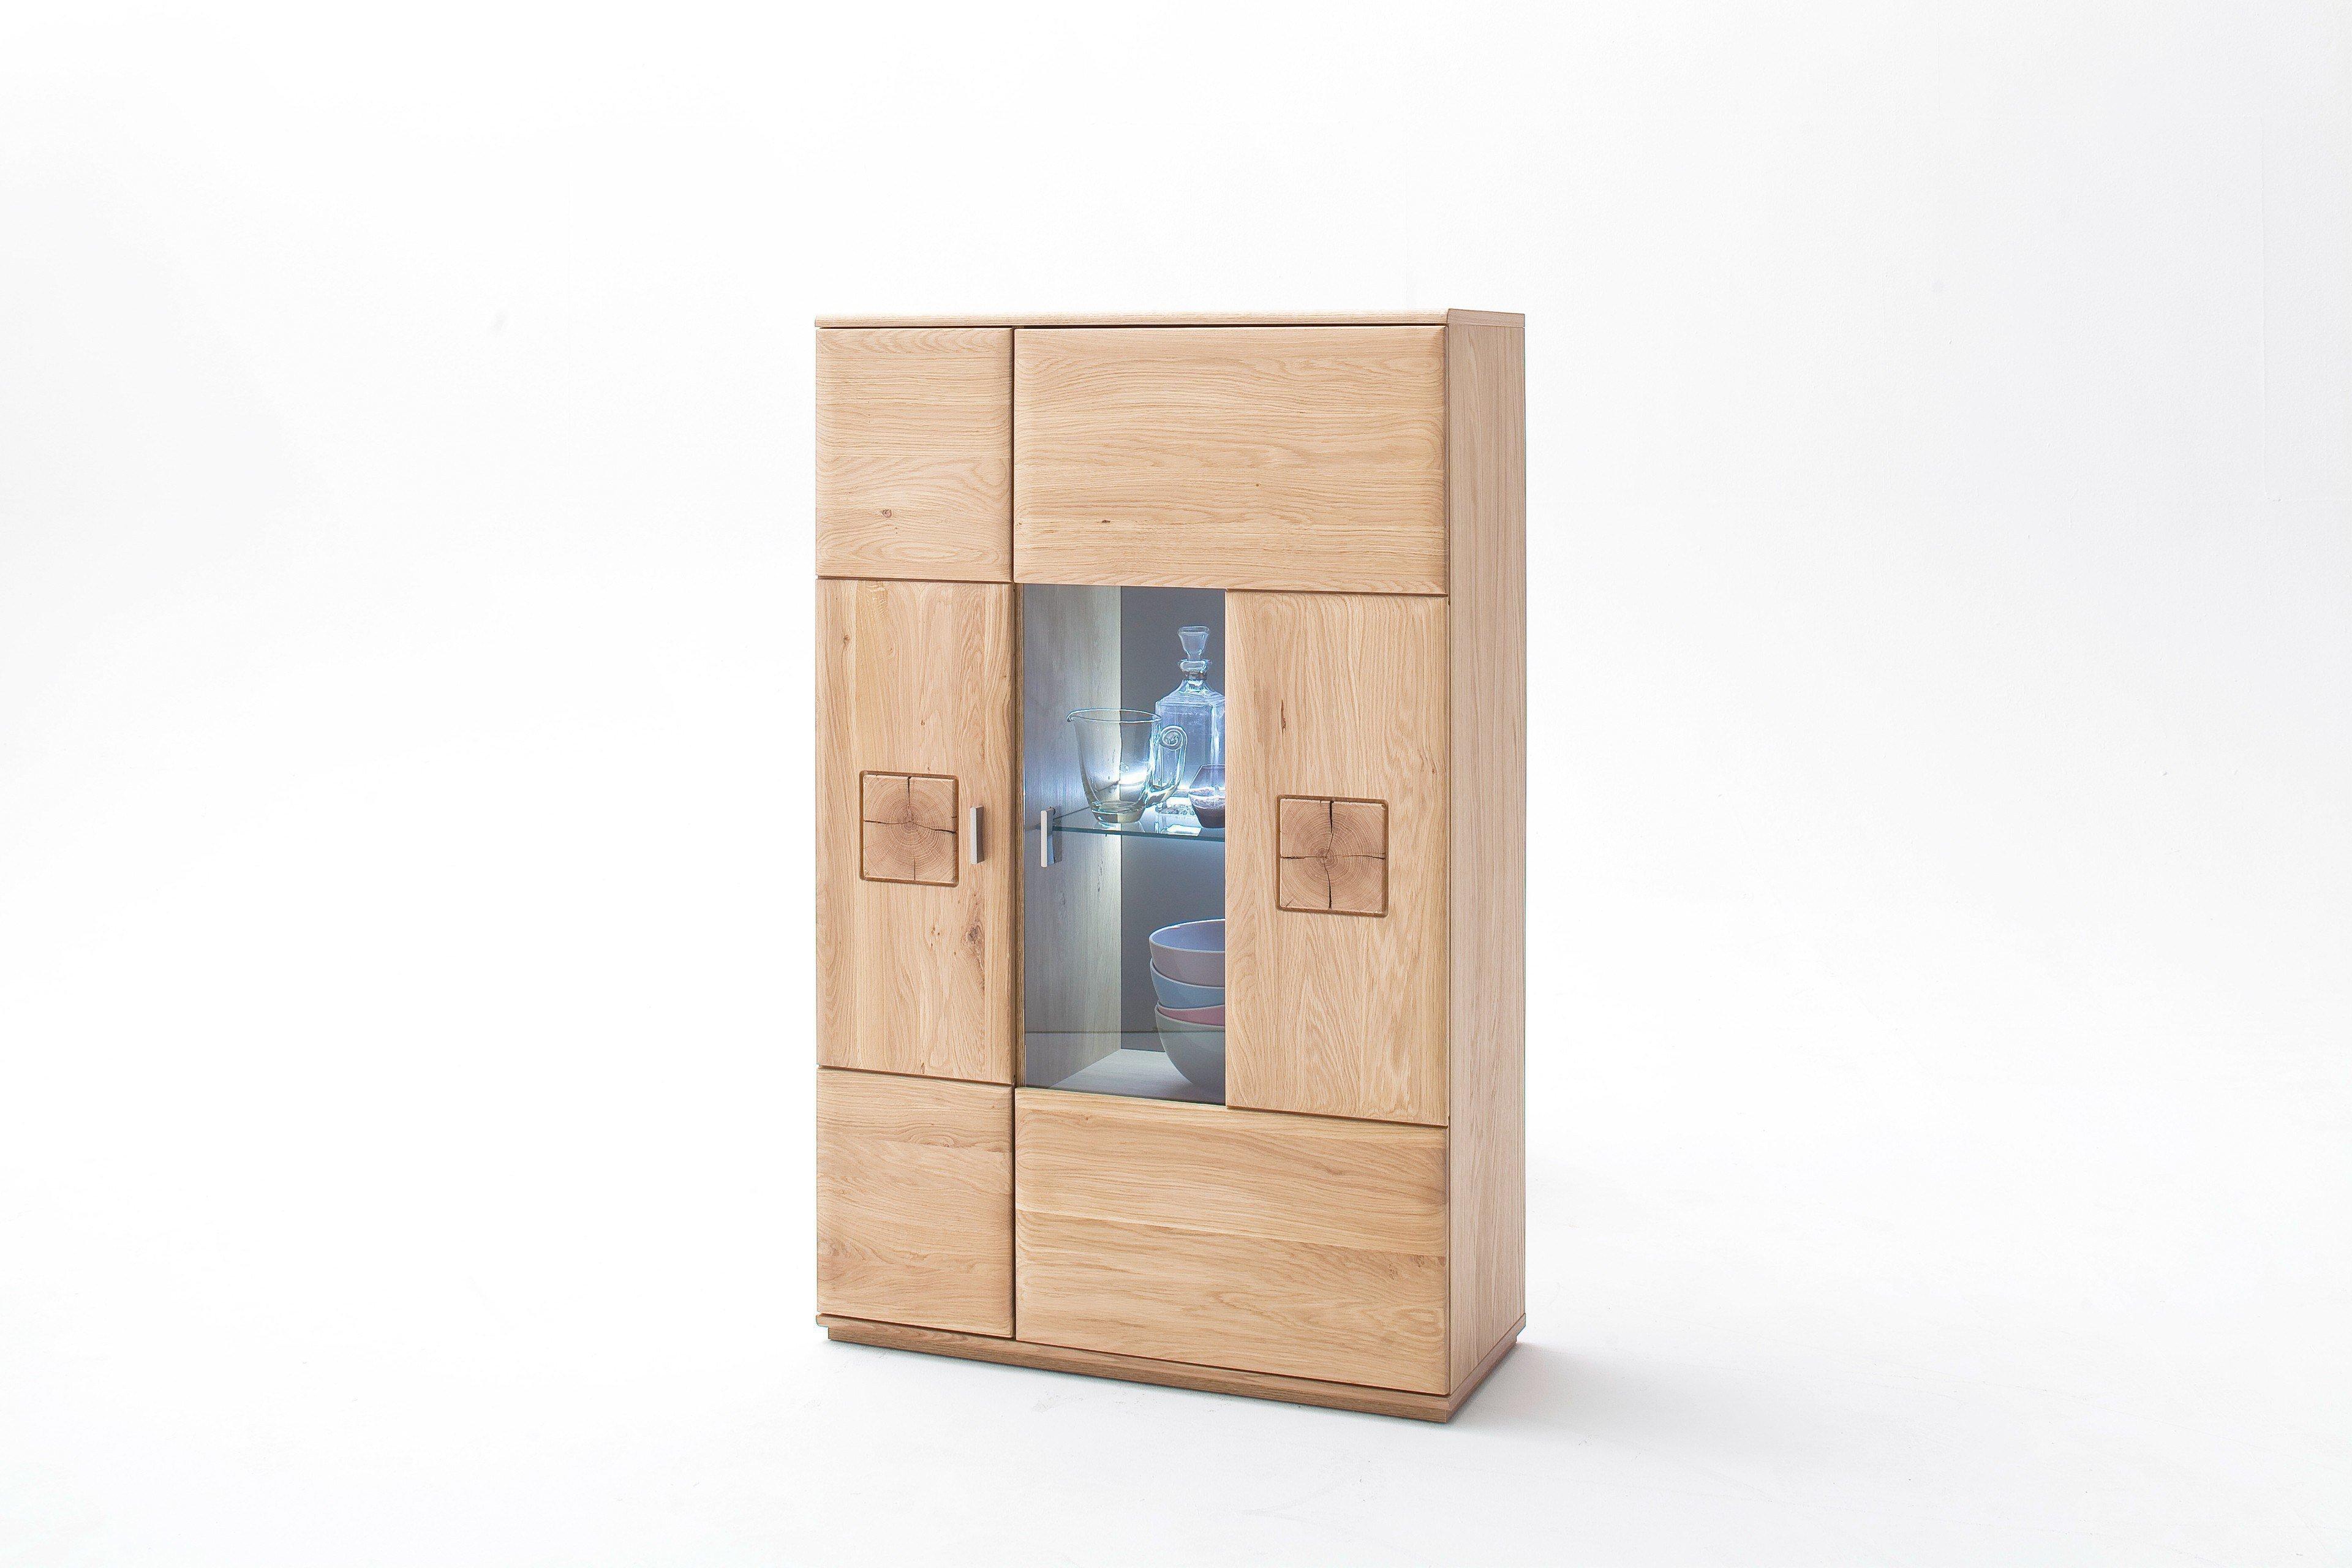 mca bologna highboard in eiche m bel letz ihr online shop. Black Bedroom Furniture Sets. Home Design Ideas